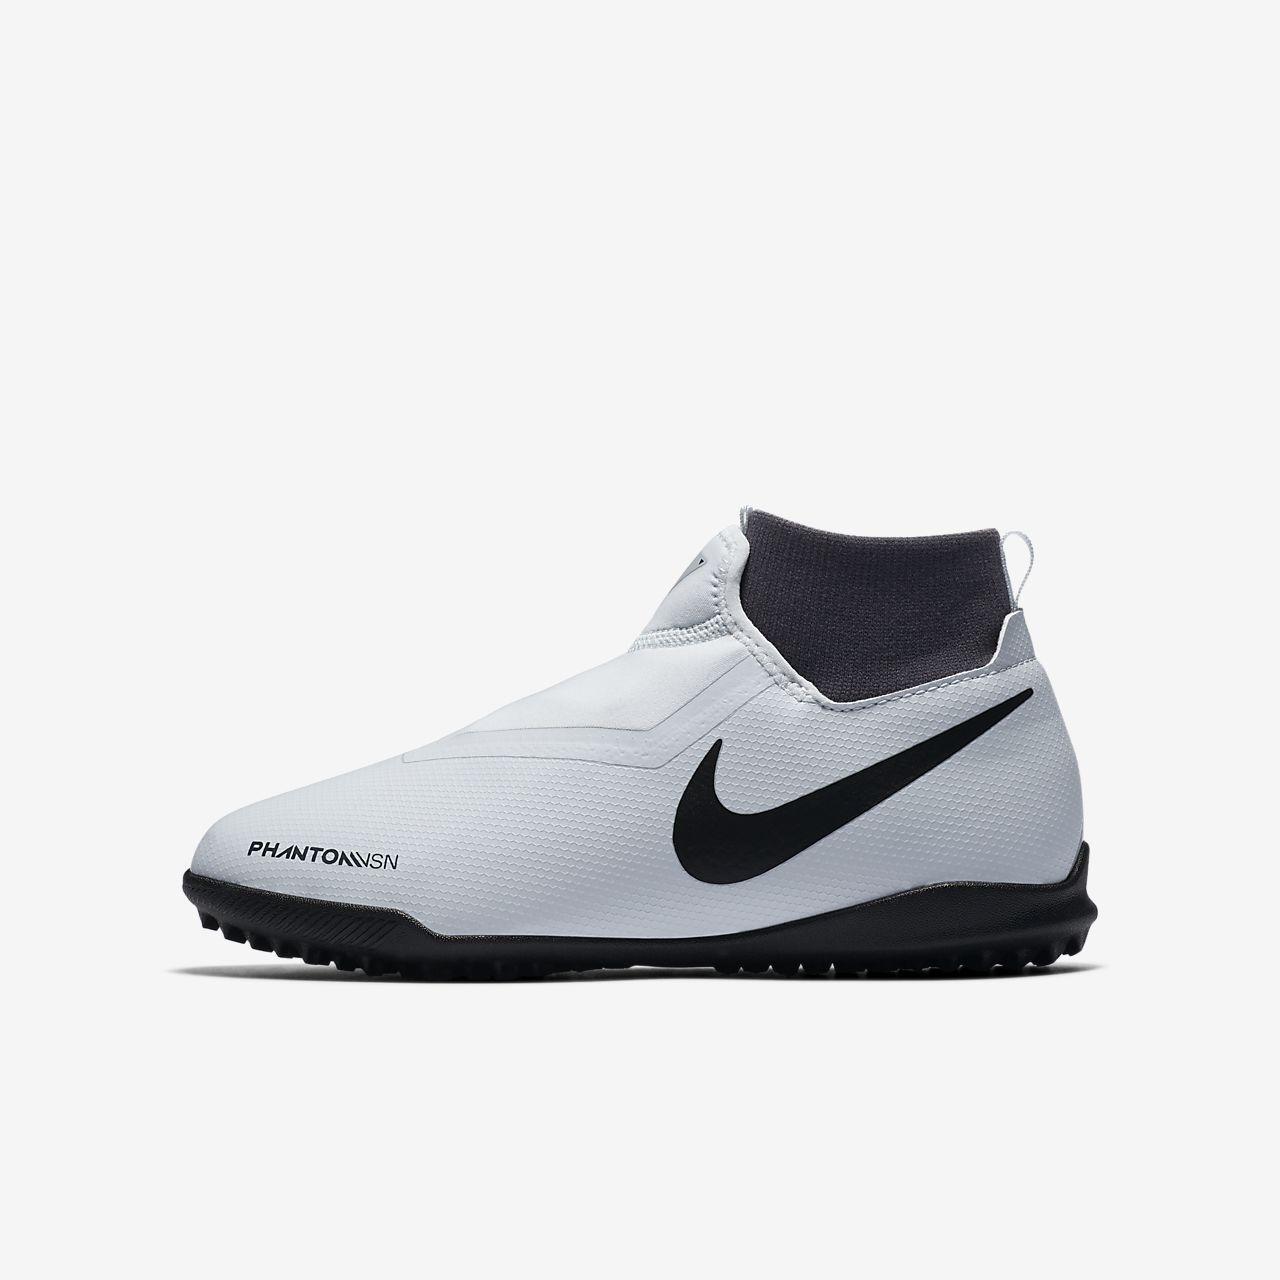 4ded94b83361 Nike Jr. Phantom Vision Academy Dynamic Fit Younger Older Kids  Turf ...